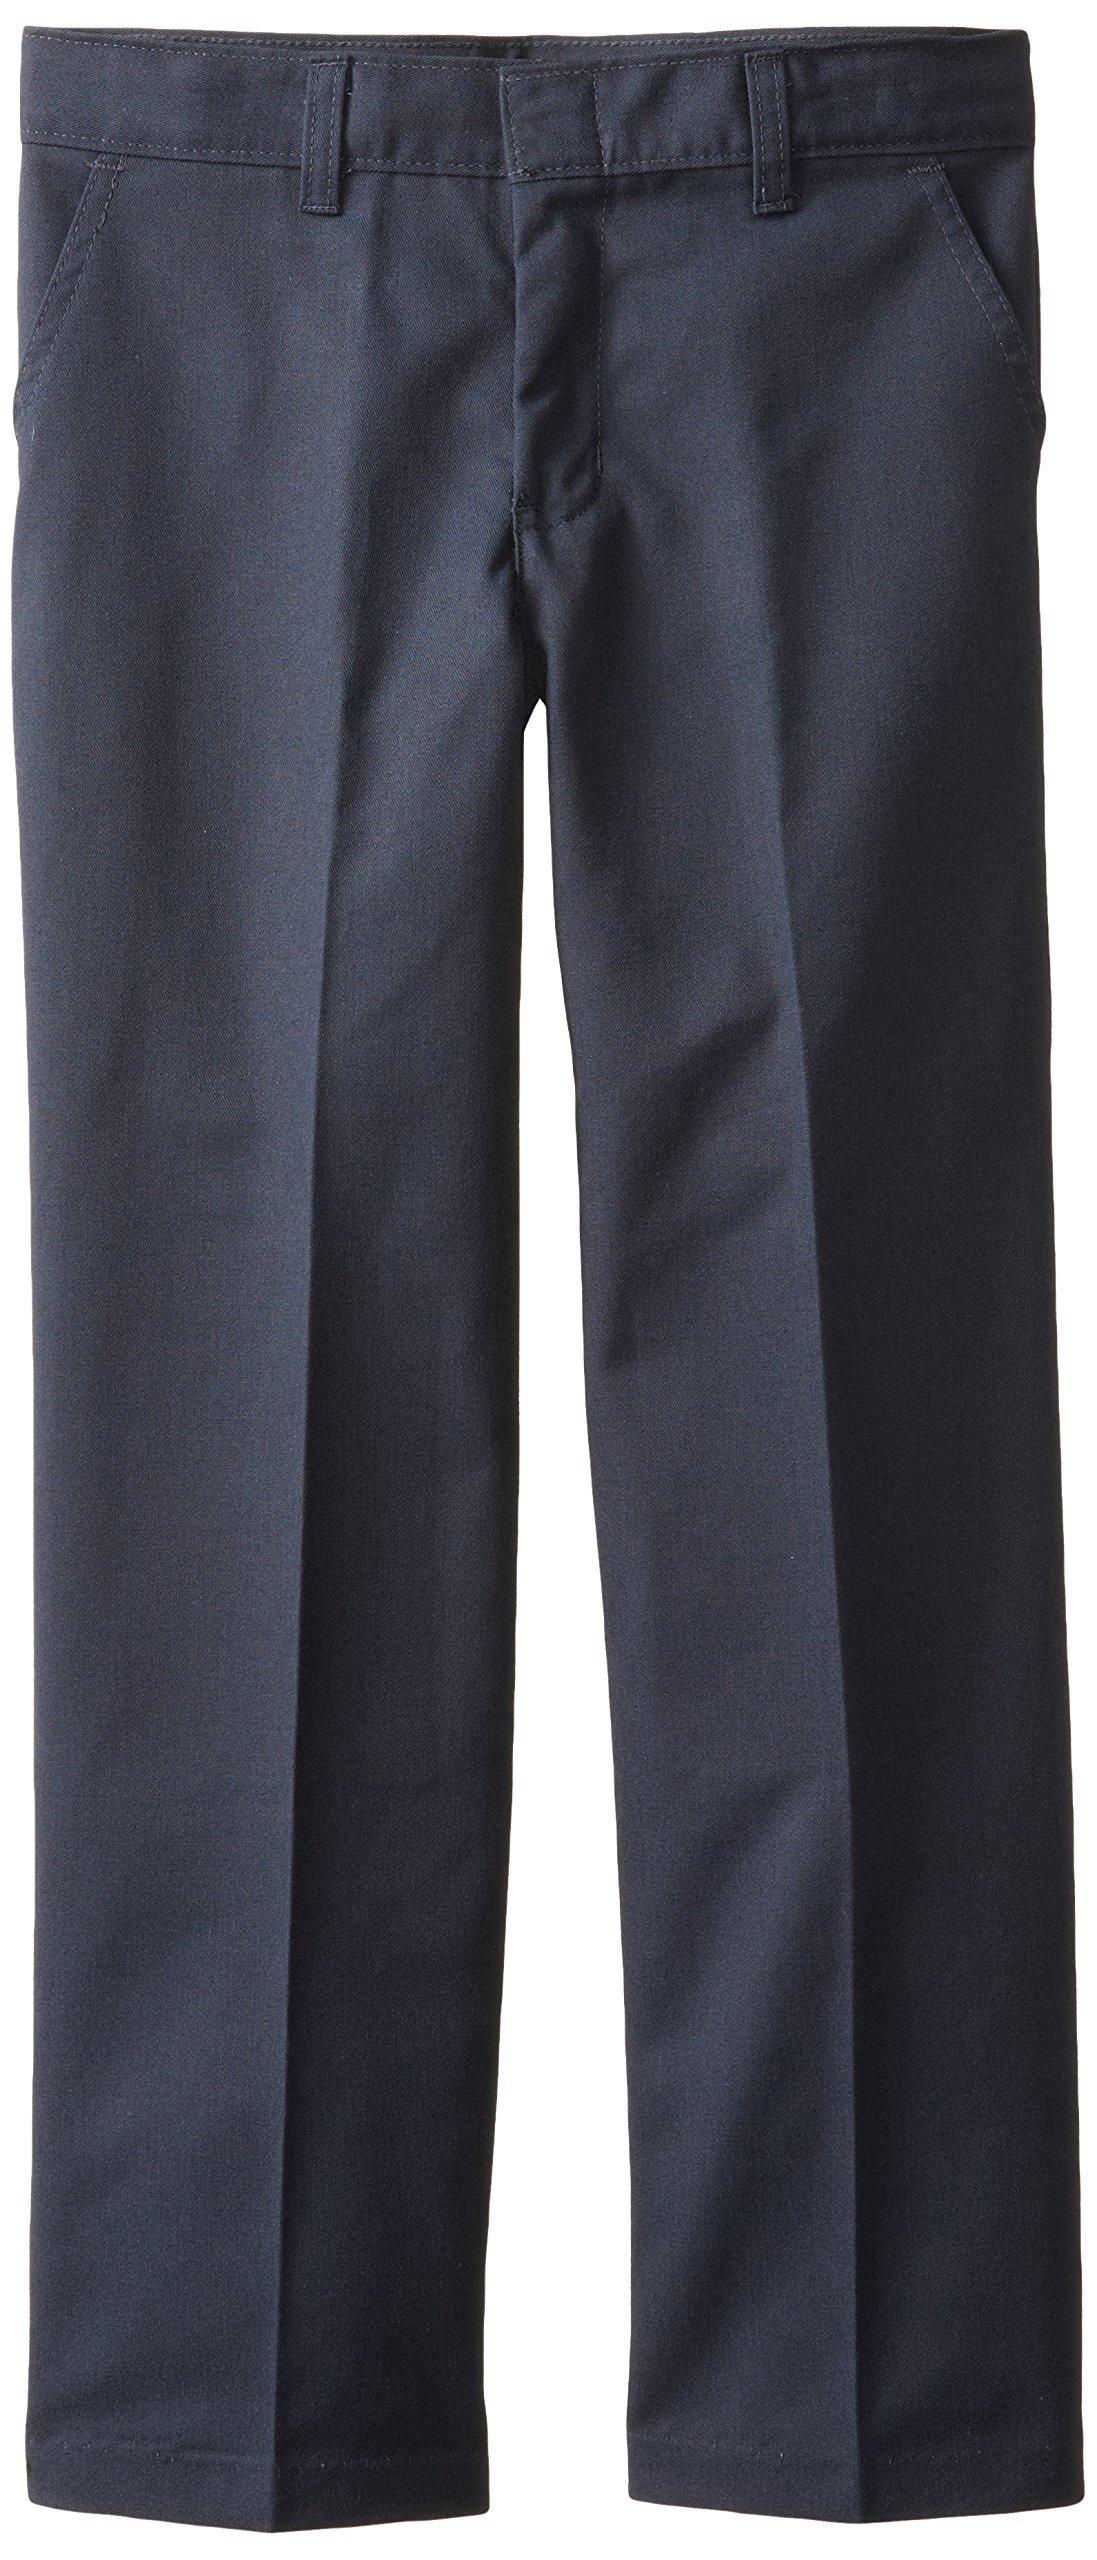 Dickies Big Boys' Flex Waist Flat Front Pant, Dark Navy, 10 Husky by dickies